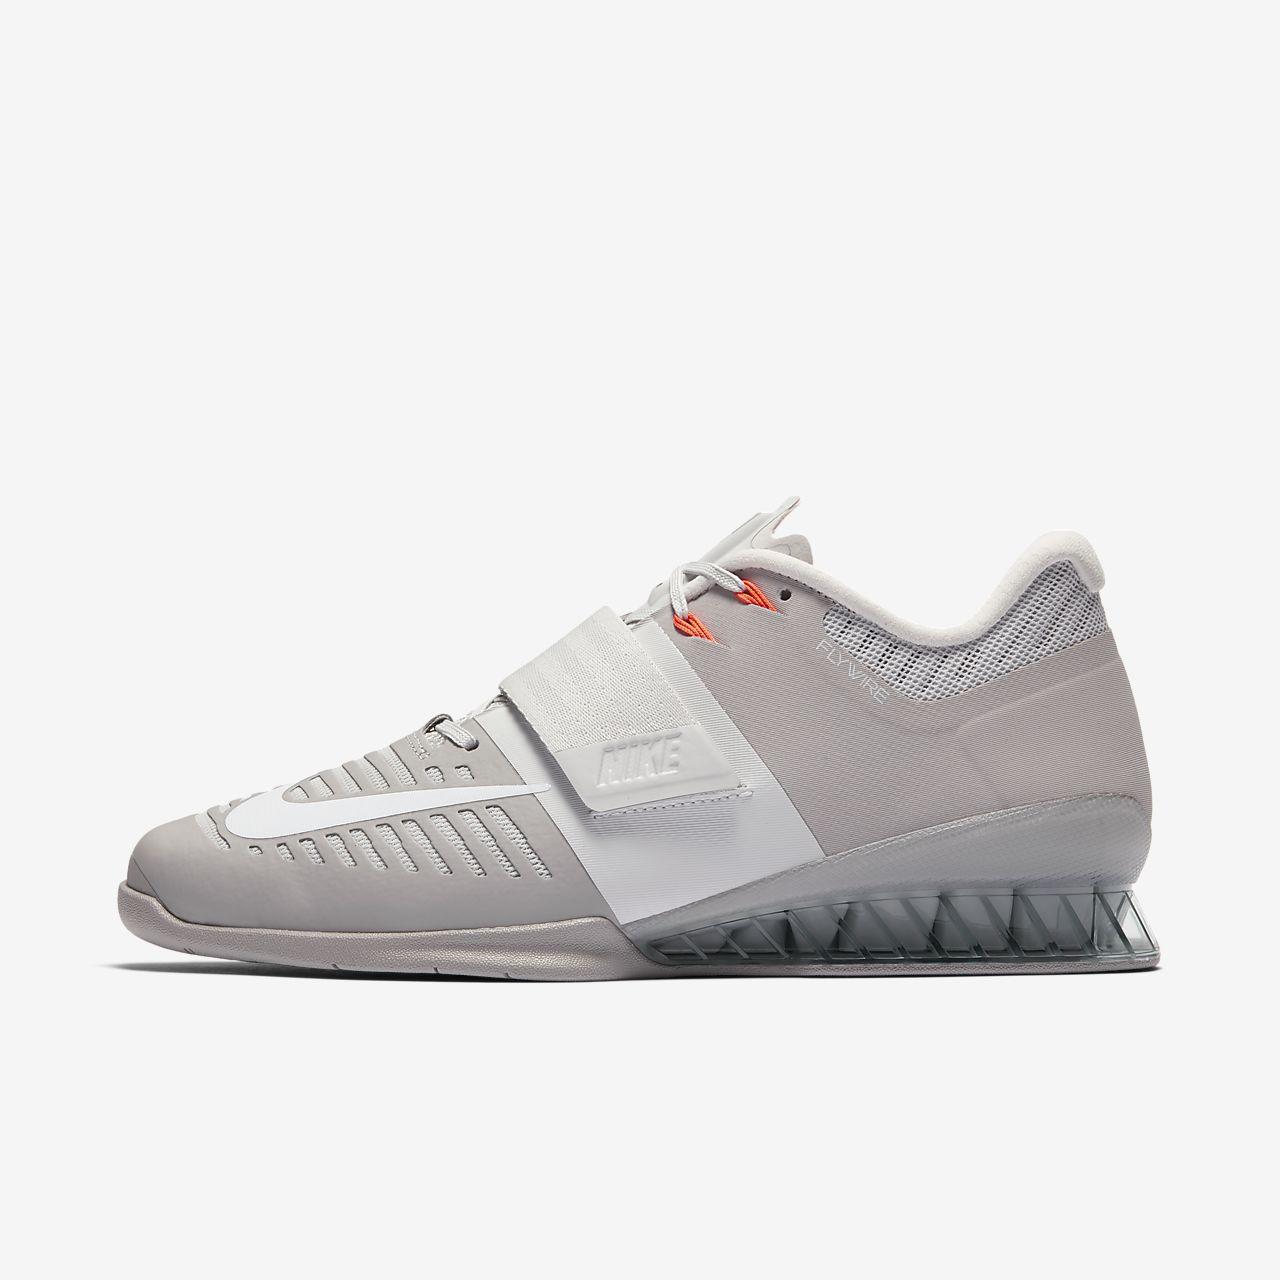 De Romaleos Nike Renforcement 3 Musculaire Fr Chaussure BCHwdnqwx